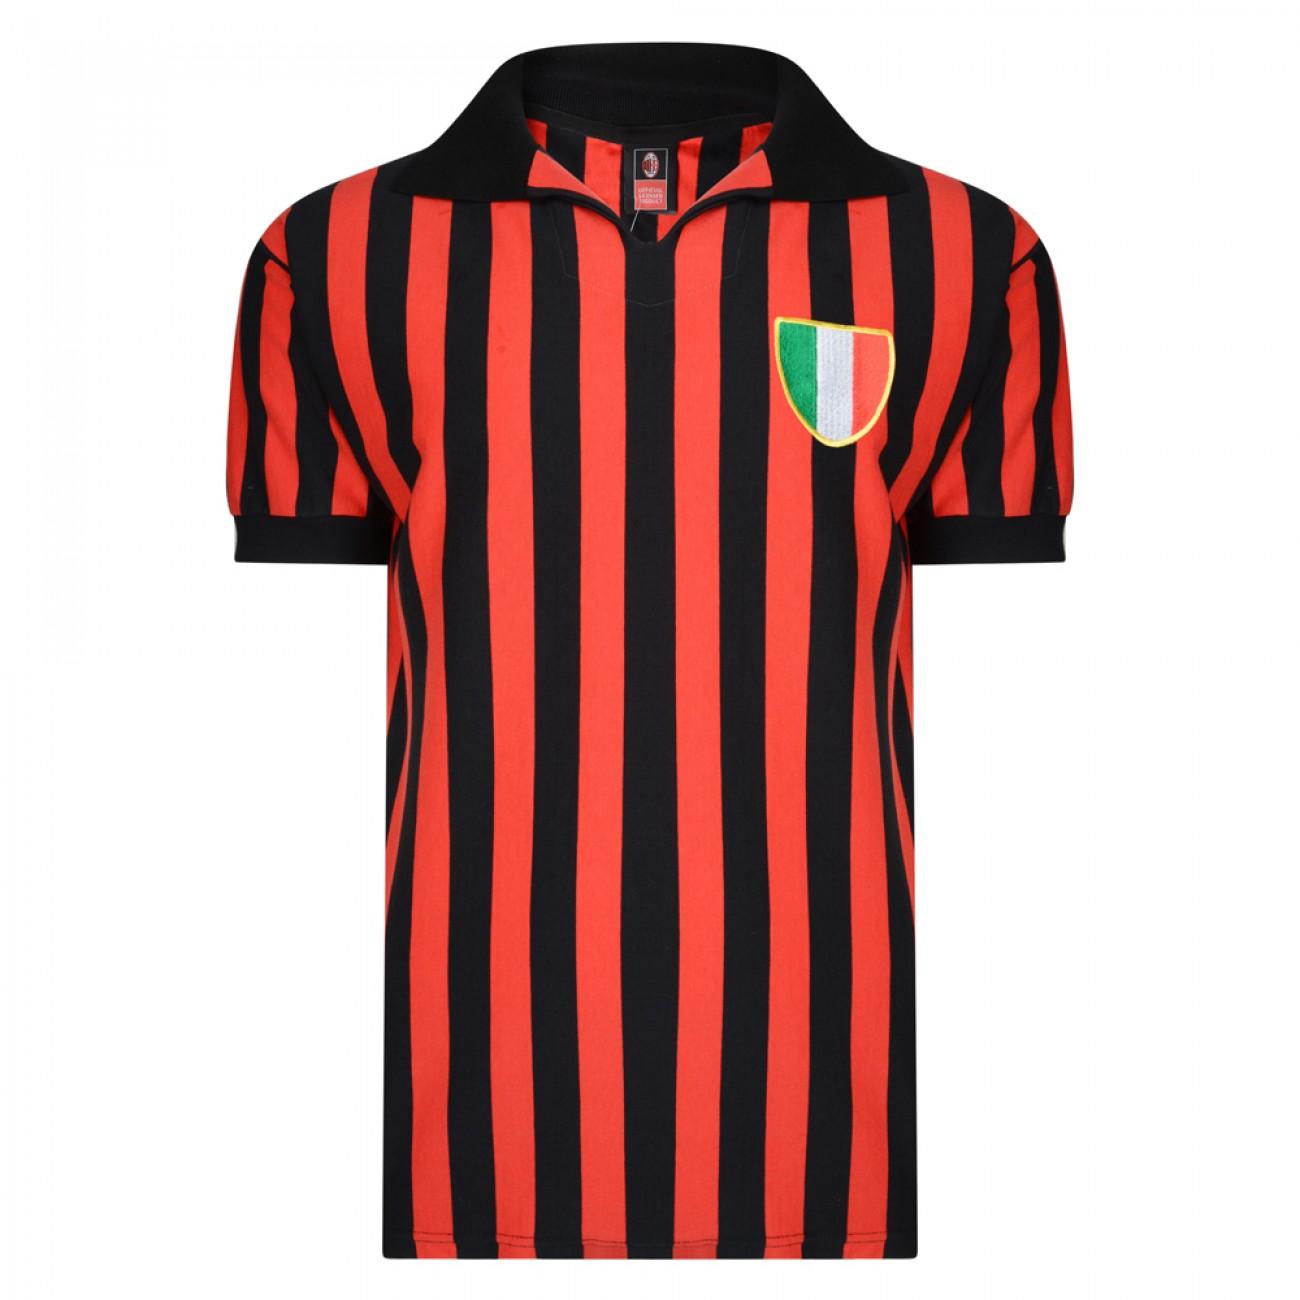 829e9bf97a94d Camiseta antigua AC Milan 1963 Rivera Maldini Altafini